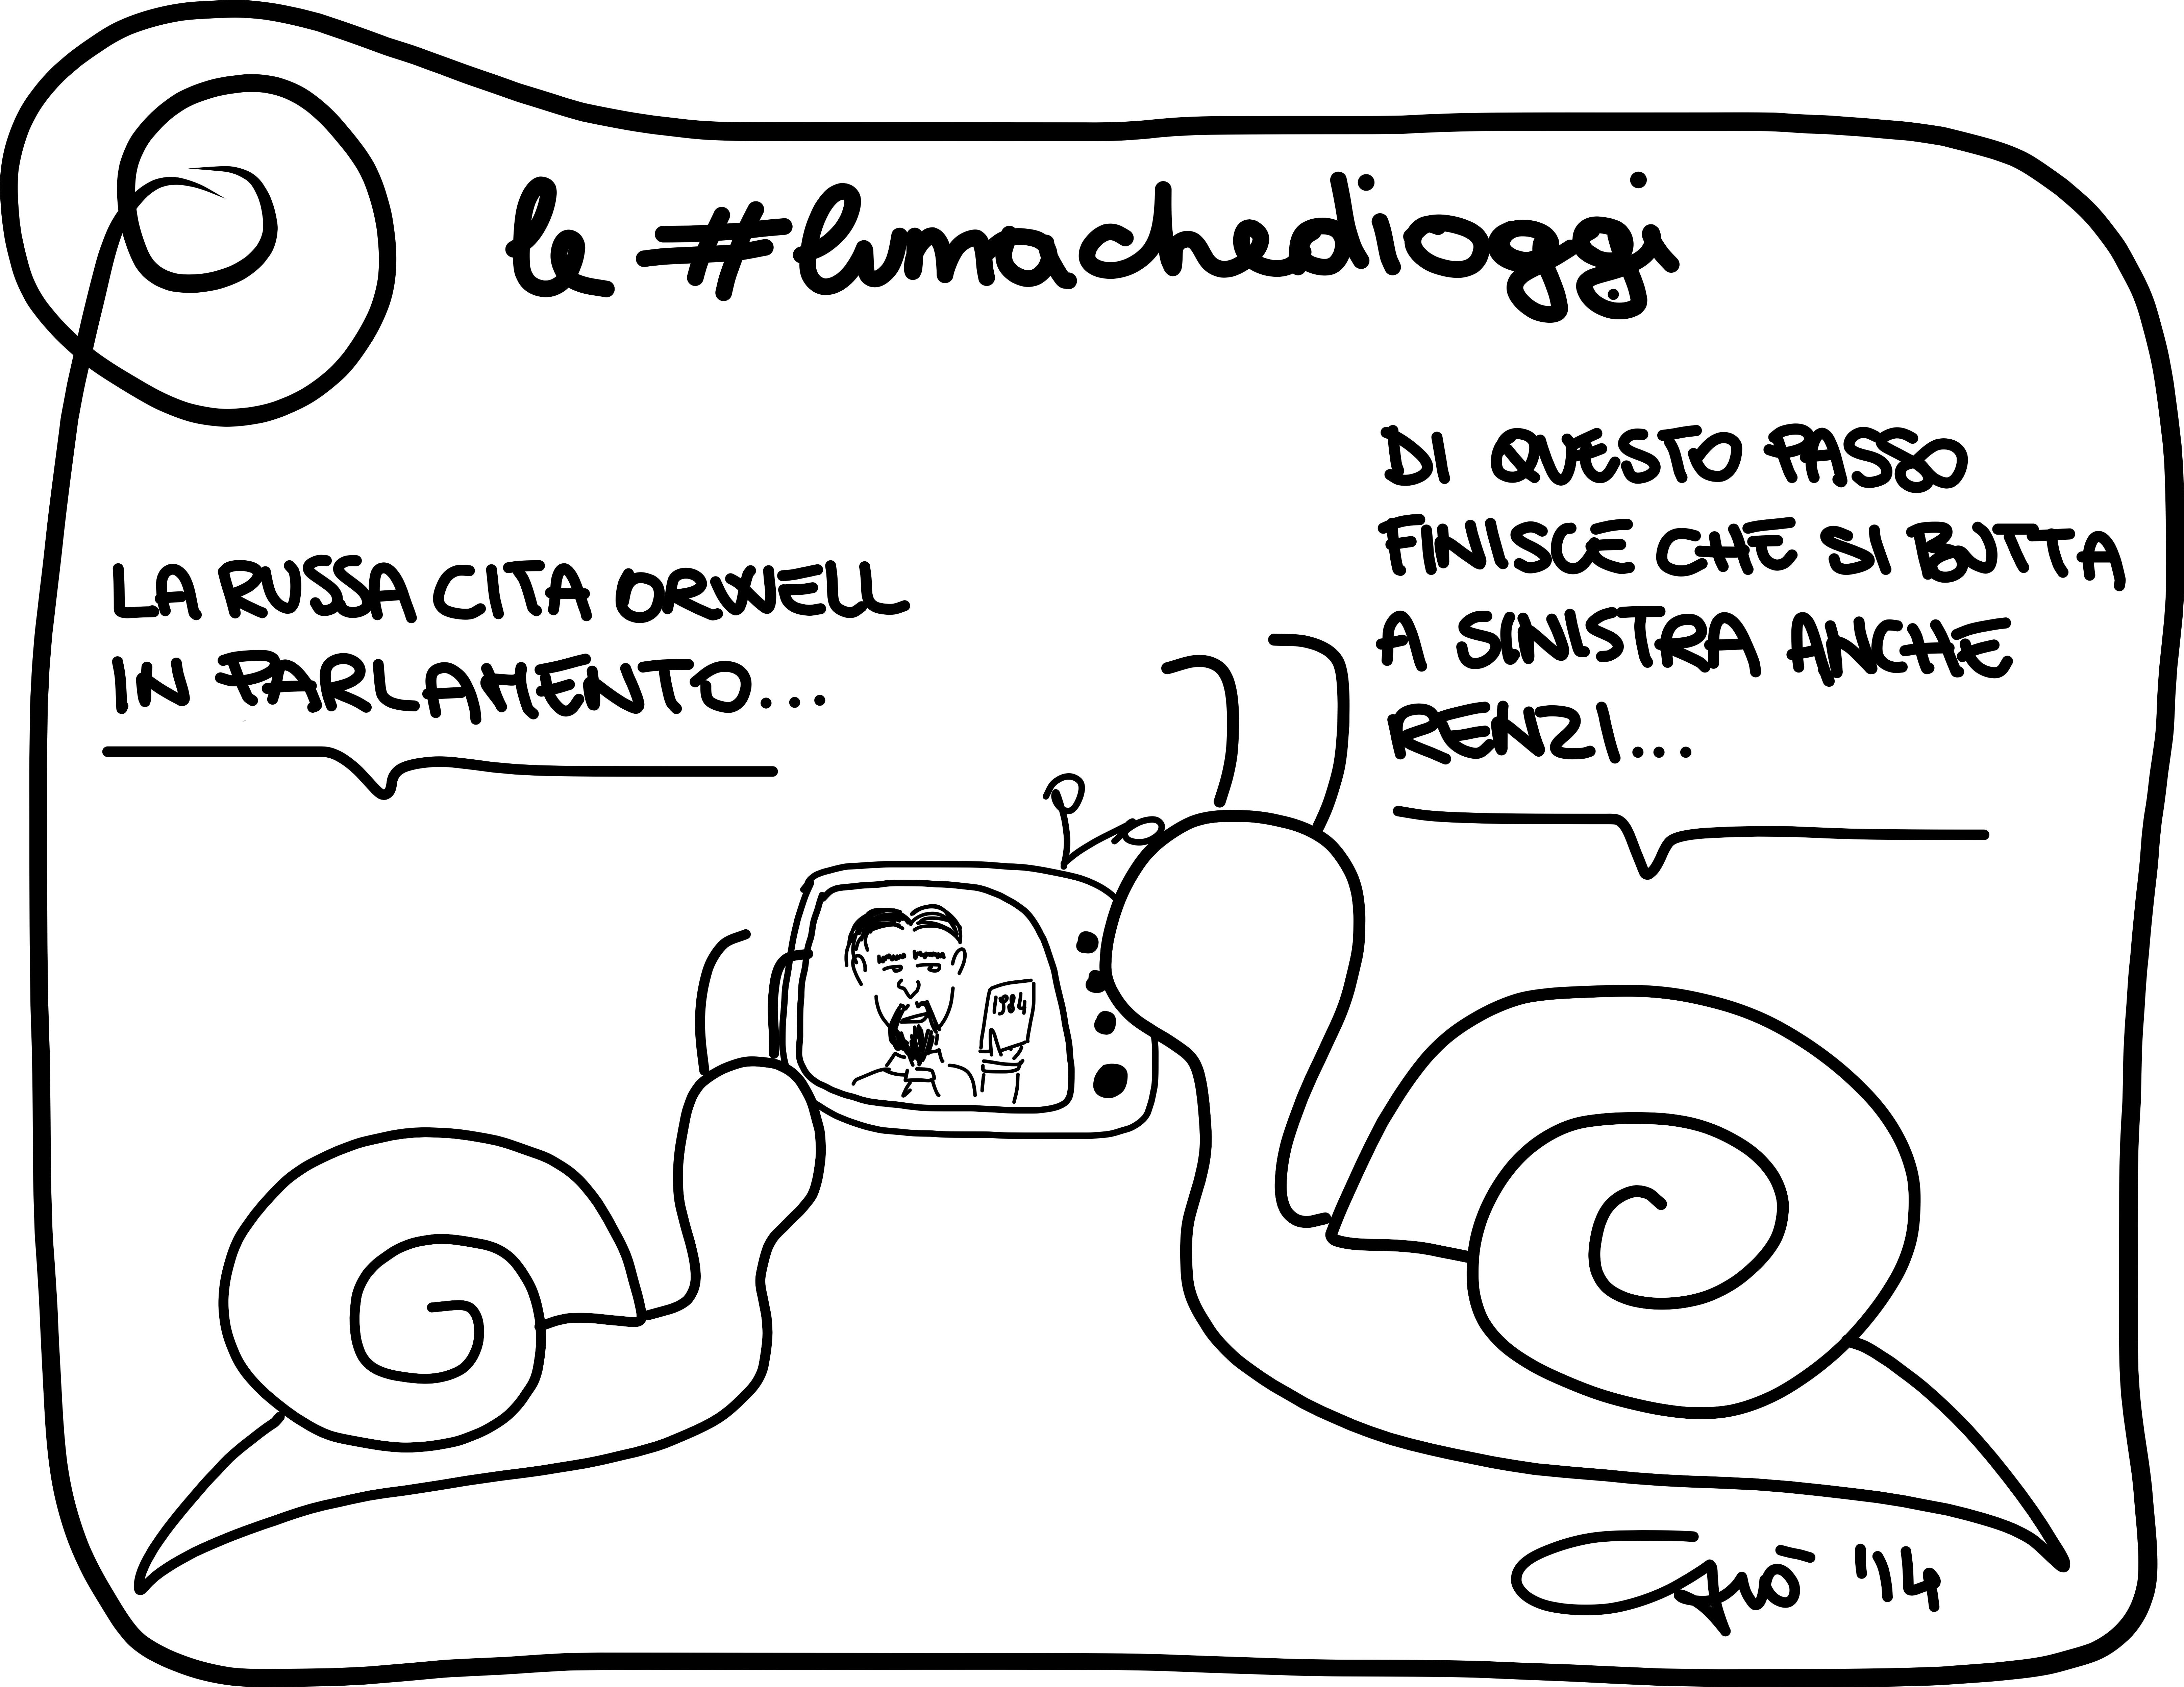 Le #lumachedioggi: orwell